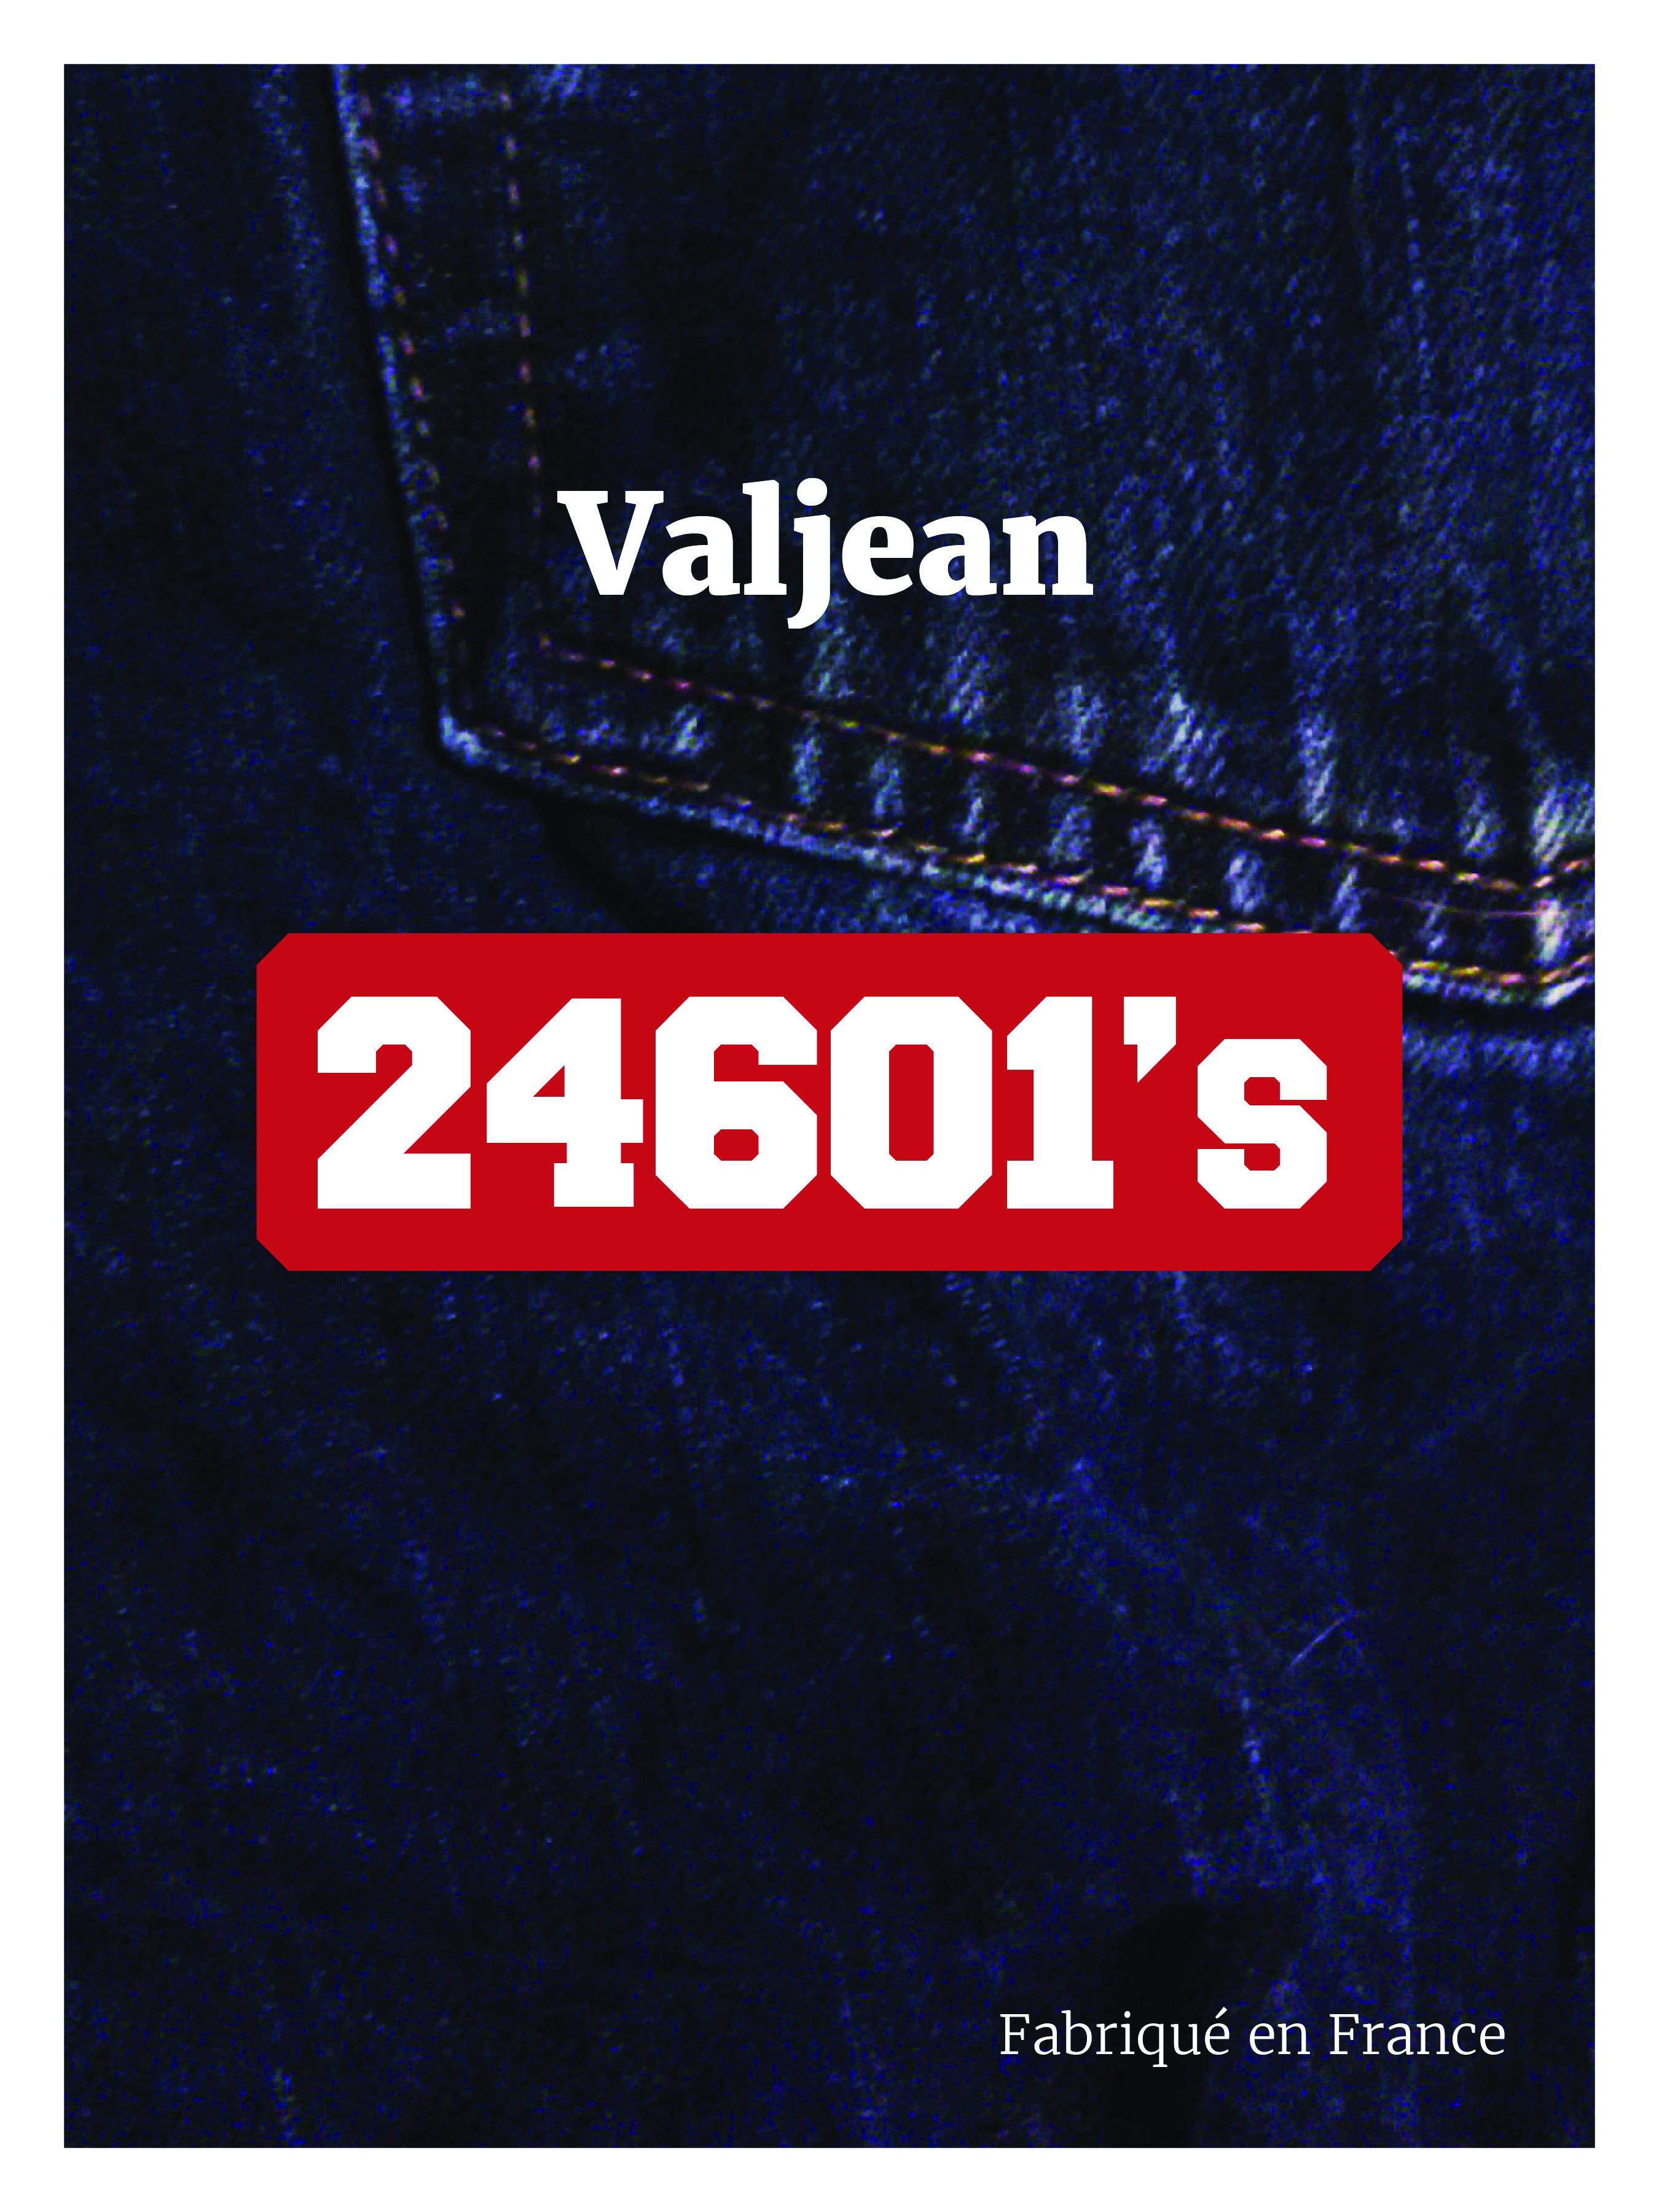 Valjean Jeans